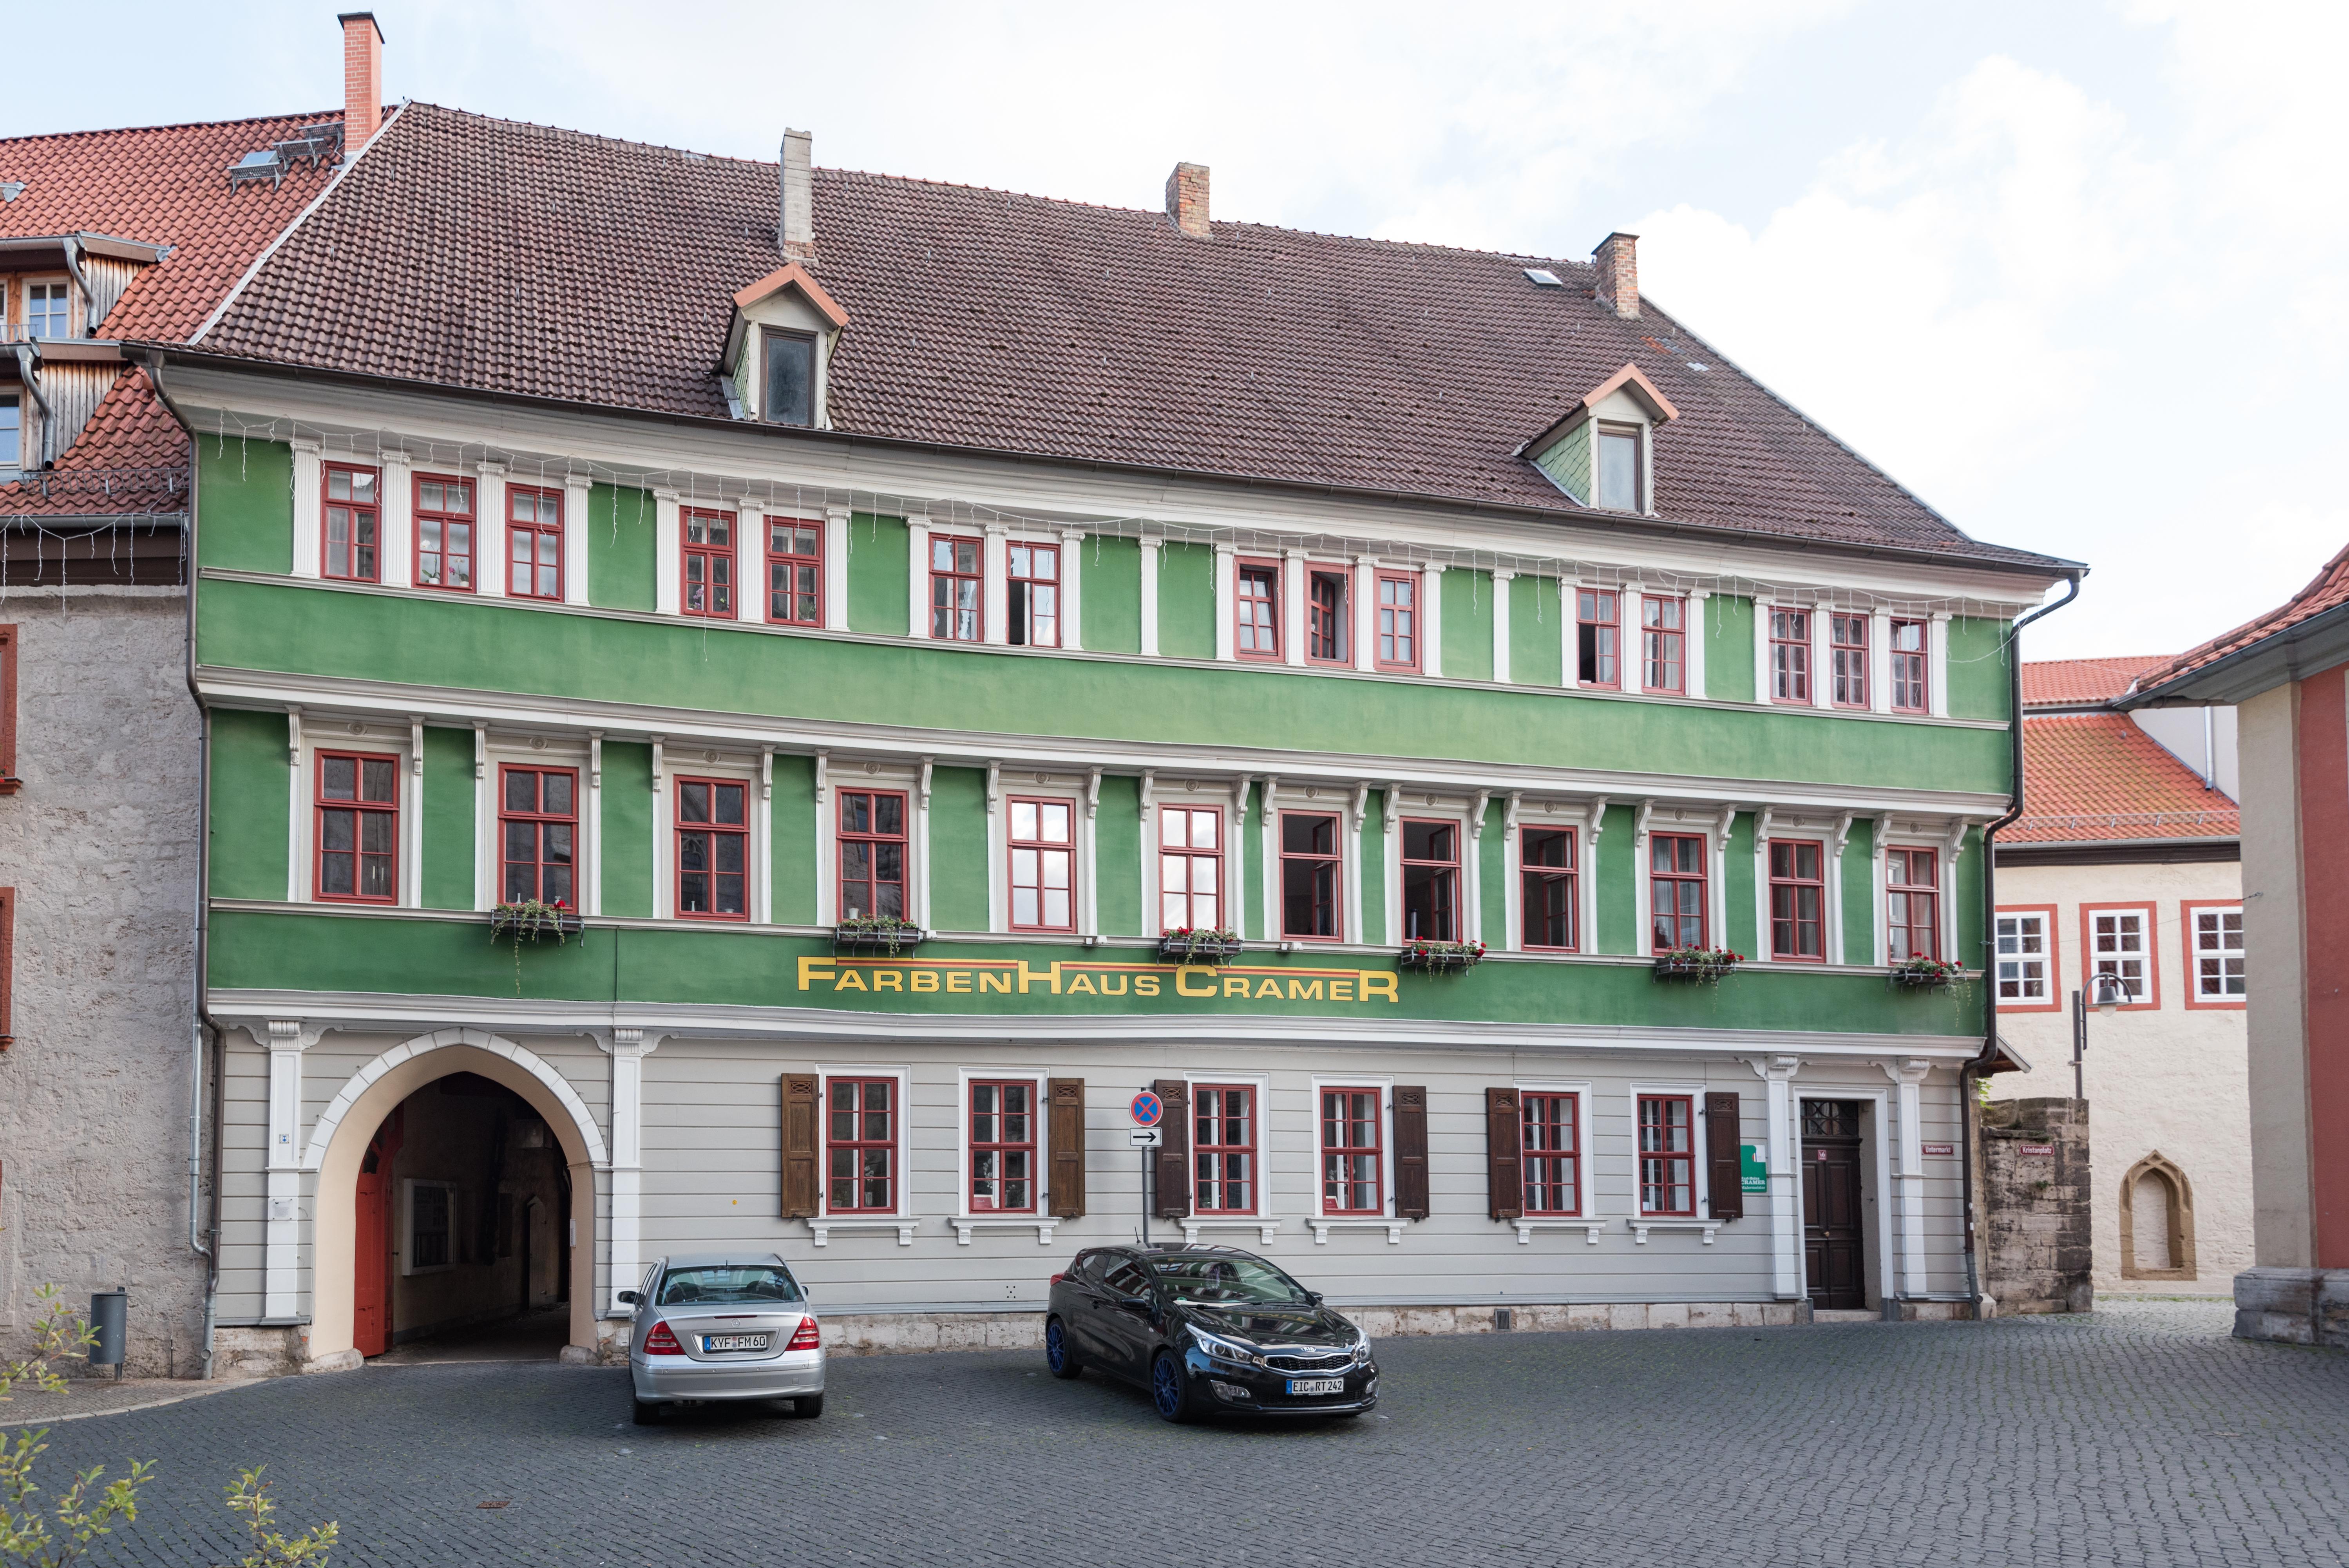 File Muhlhausen Thuringen Untermarkt 6 20170720 002 Jpg